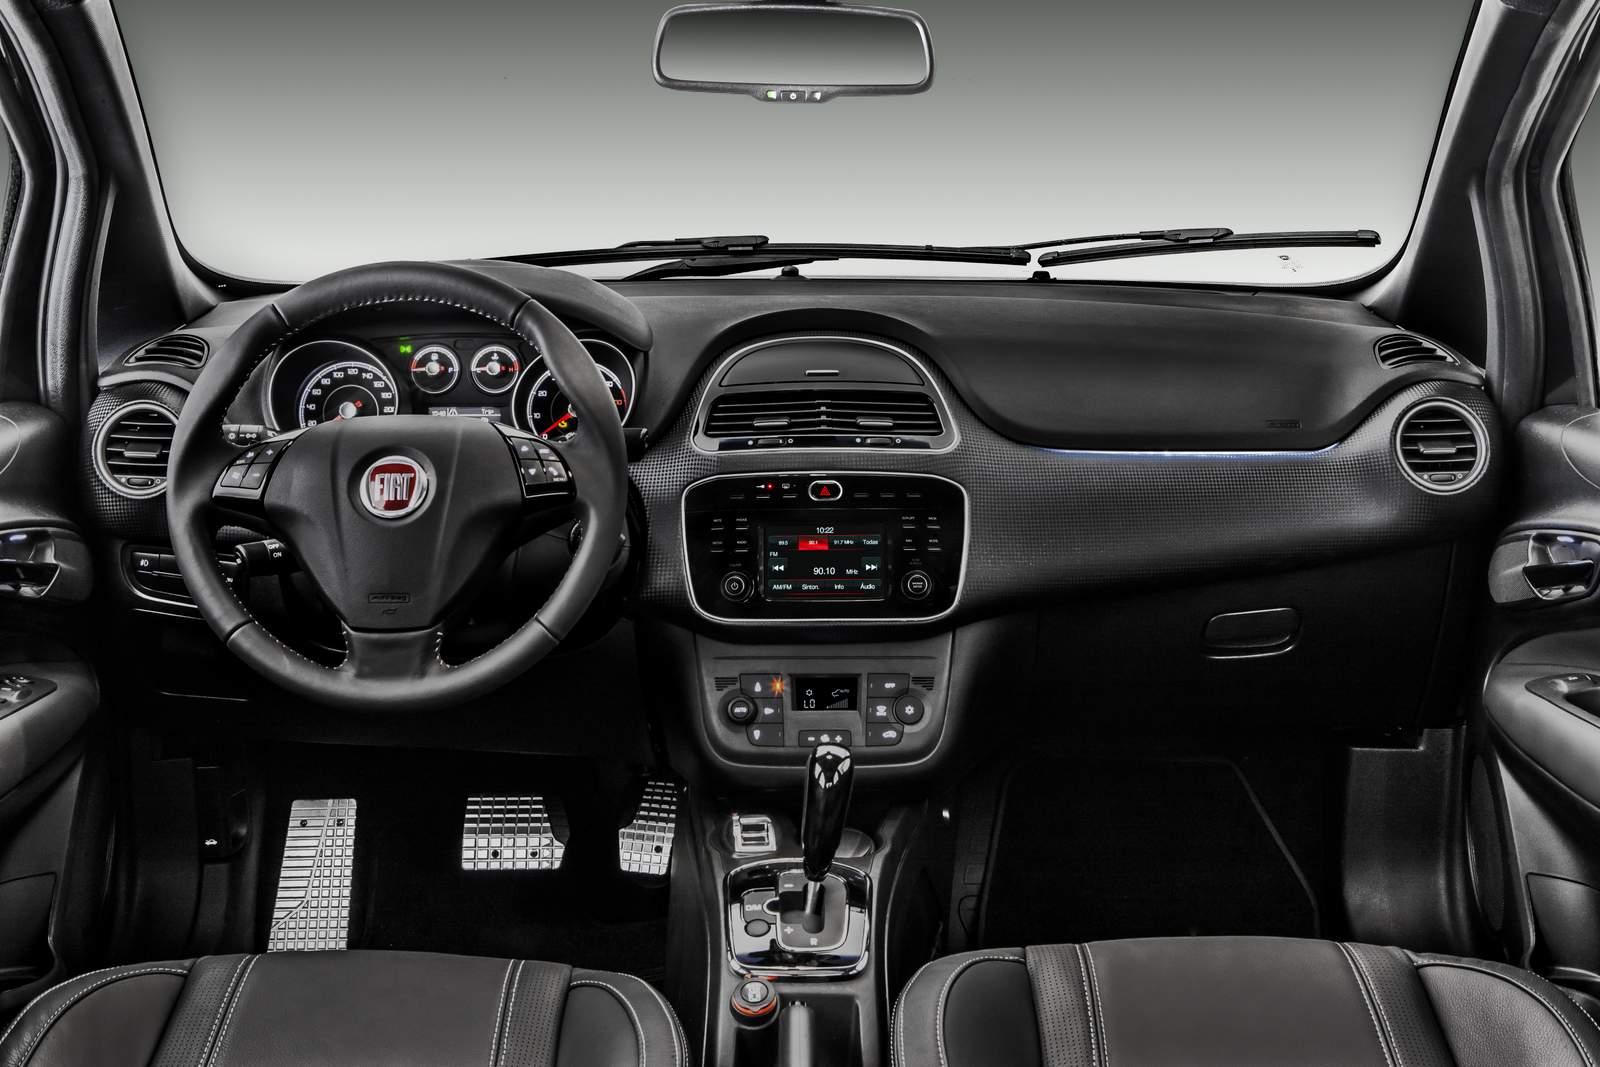 Novo Fiat Punto 2016 - interior